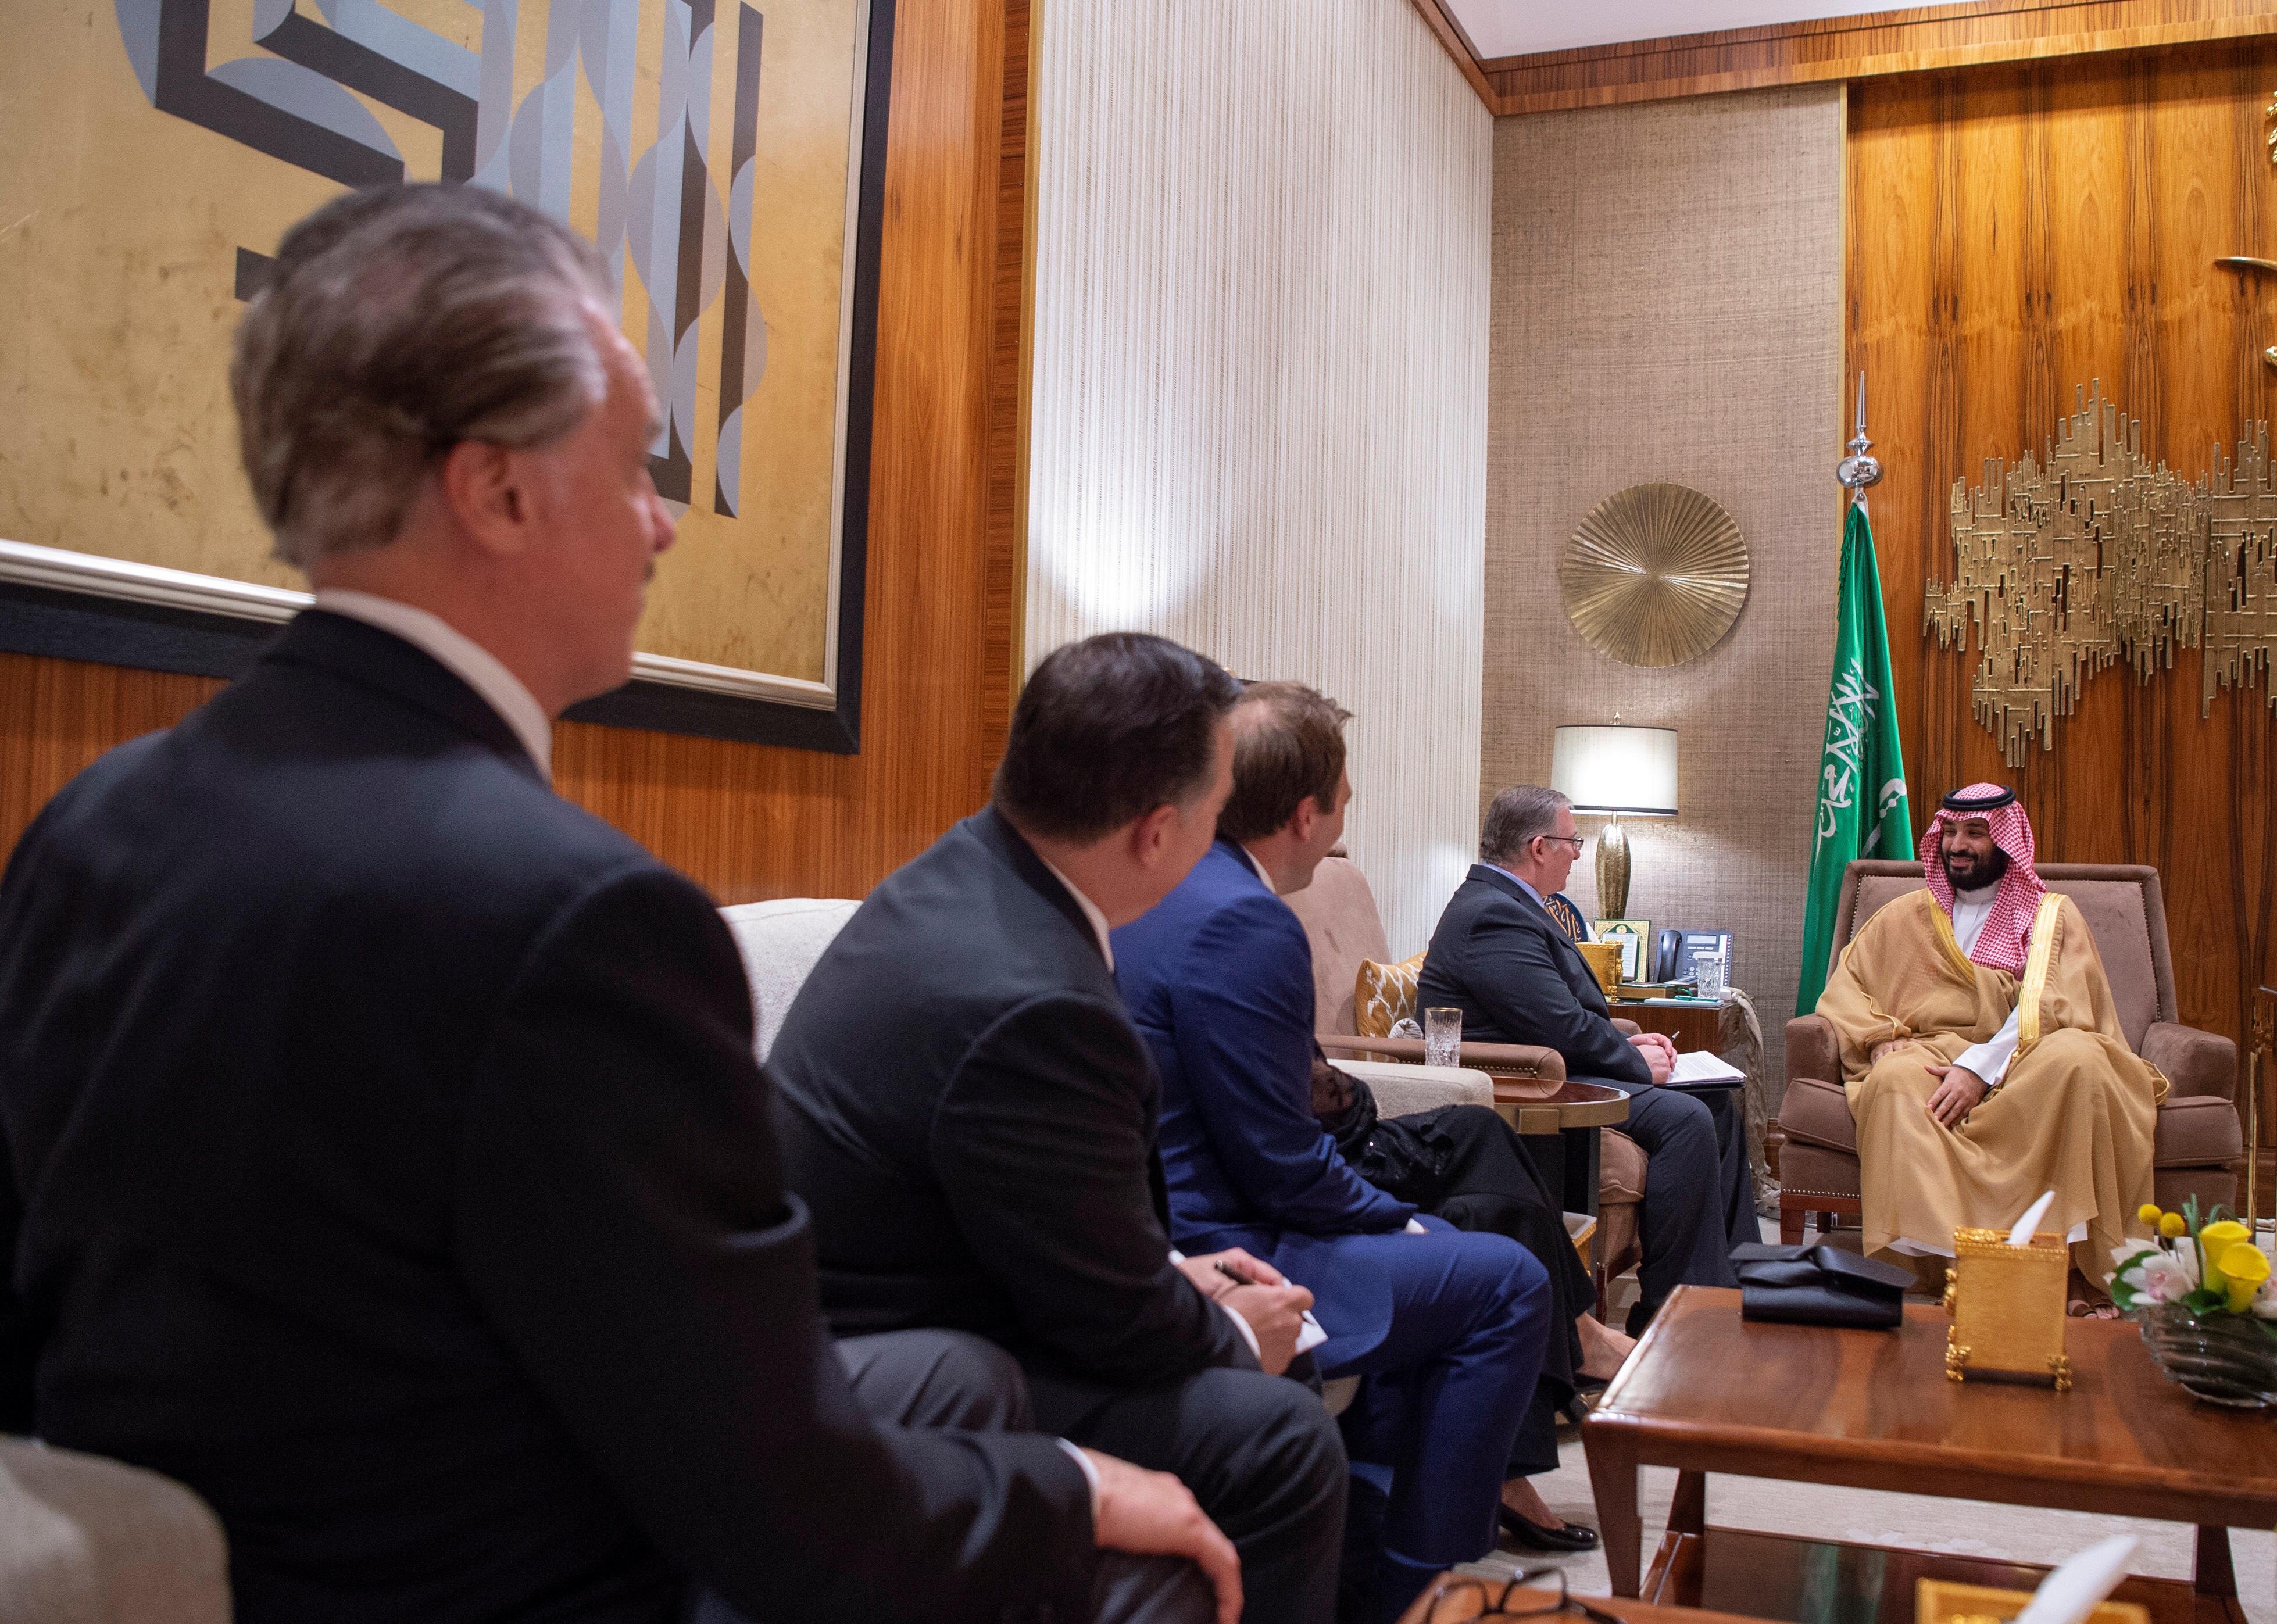 Saudi Crown Prince Mohammed bin Salmanin meets with the delegation of American Evangelical Christian Leaders in Riyadh, Saudi Arabia November 1, 2018. Bandar Algaloud/Courtesy of Saudi Royal Court/Handout via REUTERS